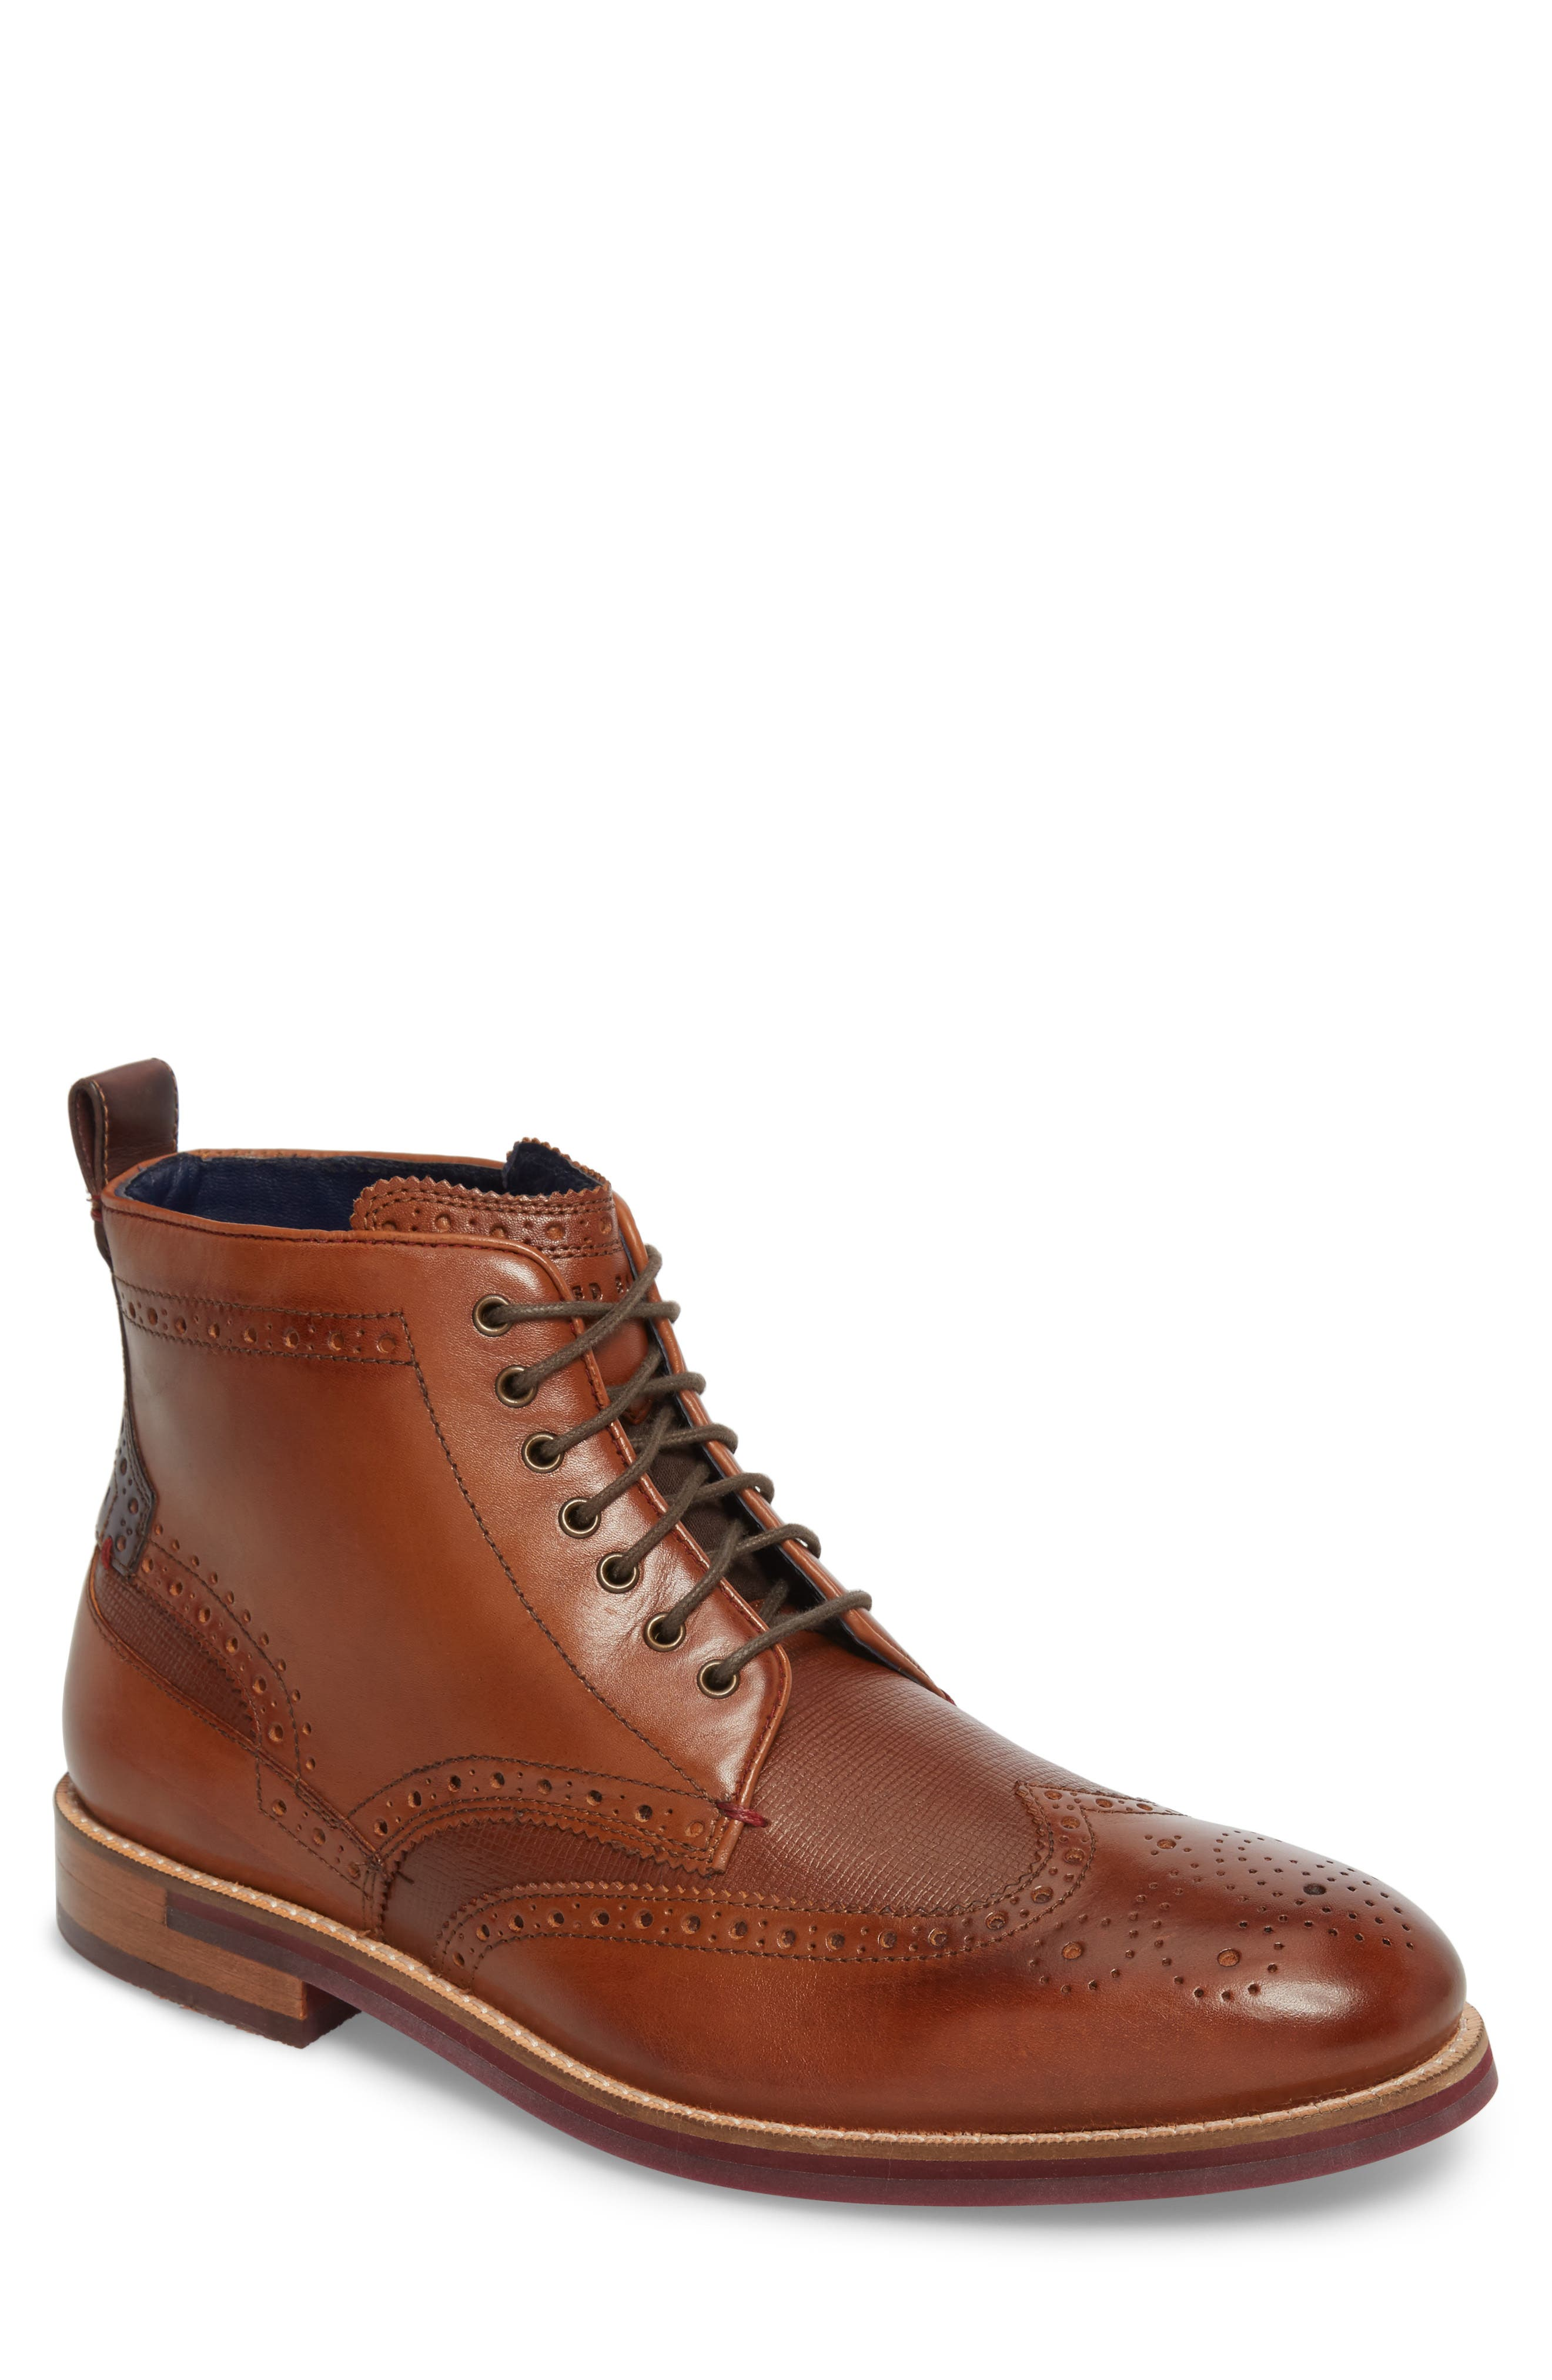 Hjenno Wingtip Boot,                             Main thumbnail 1, color,                             Tan Leather